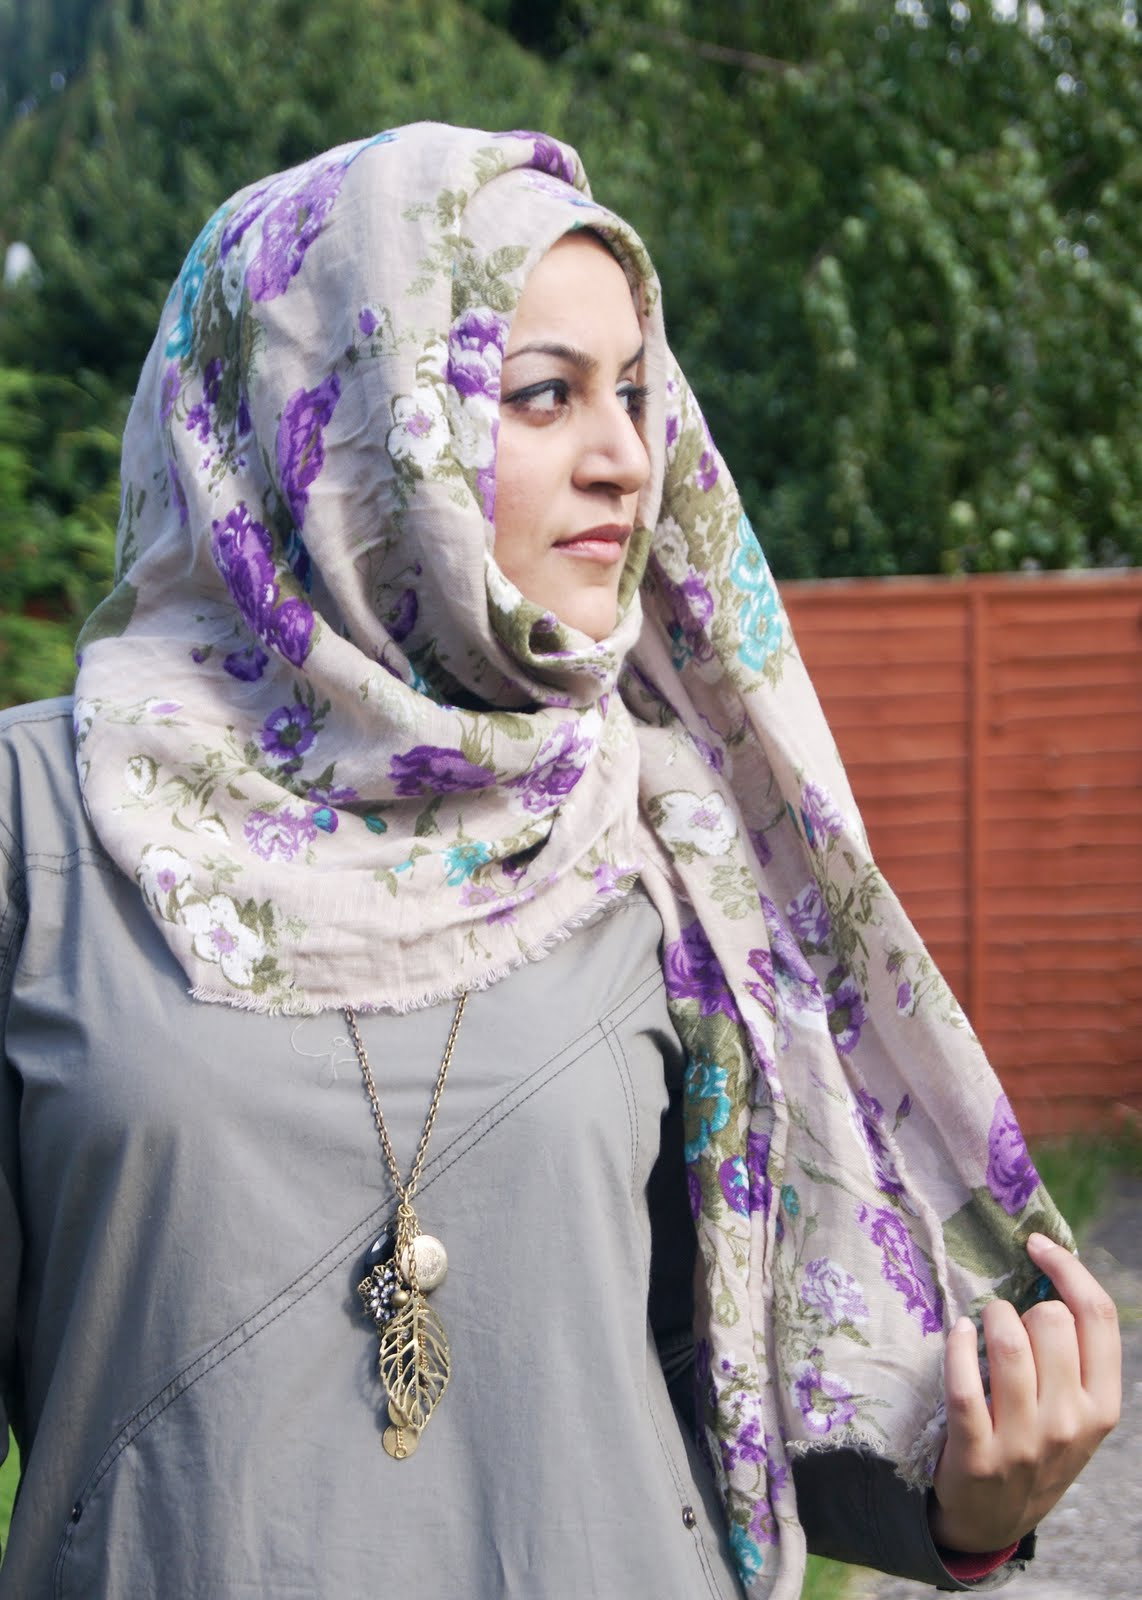 Islamic Dress Code For Male And Female